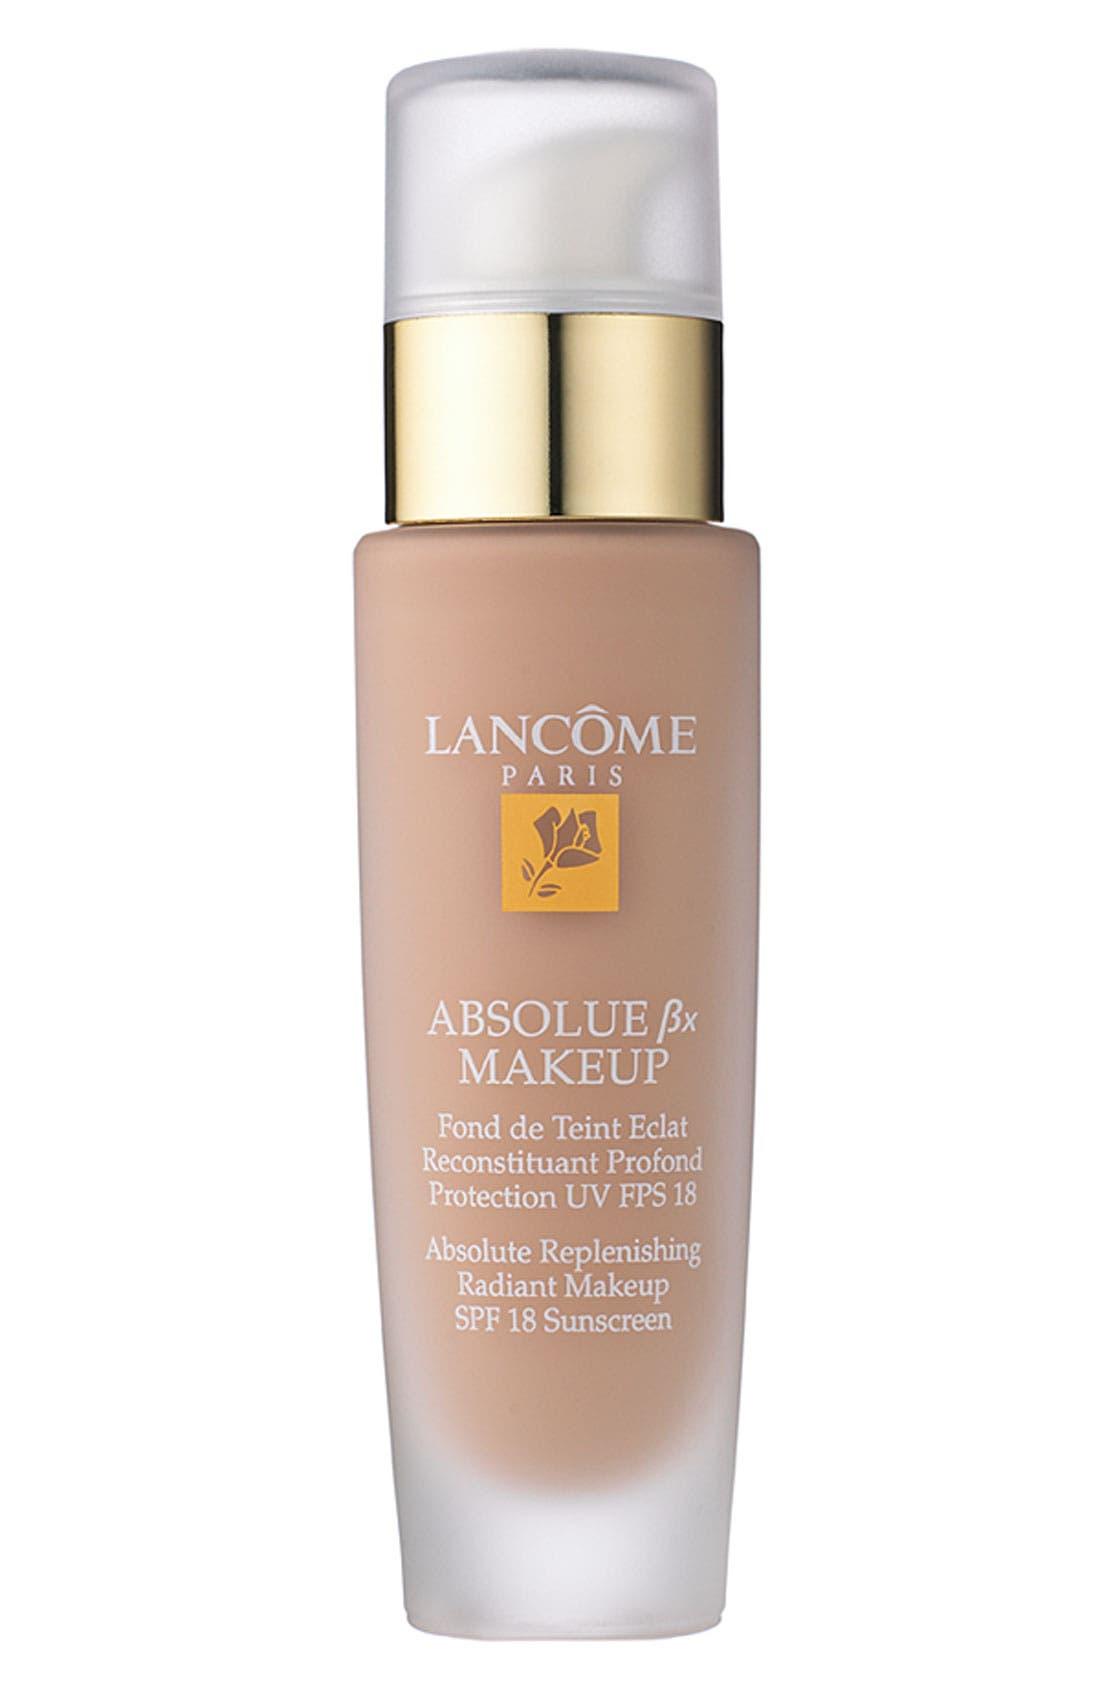 Lancome Absolue Replenishing Radiant Makeup Foundation Spf 18 Sunscreen